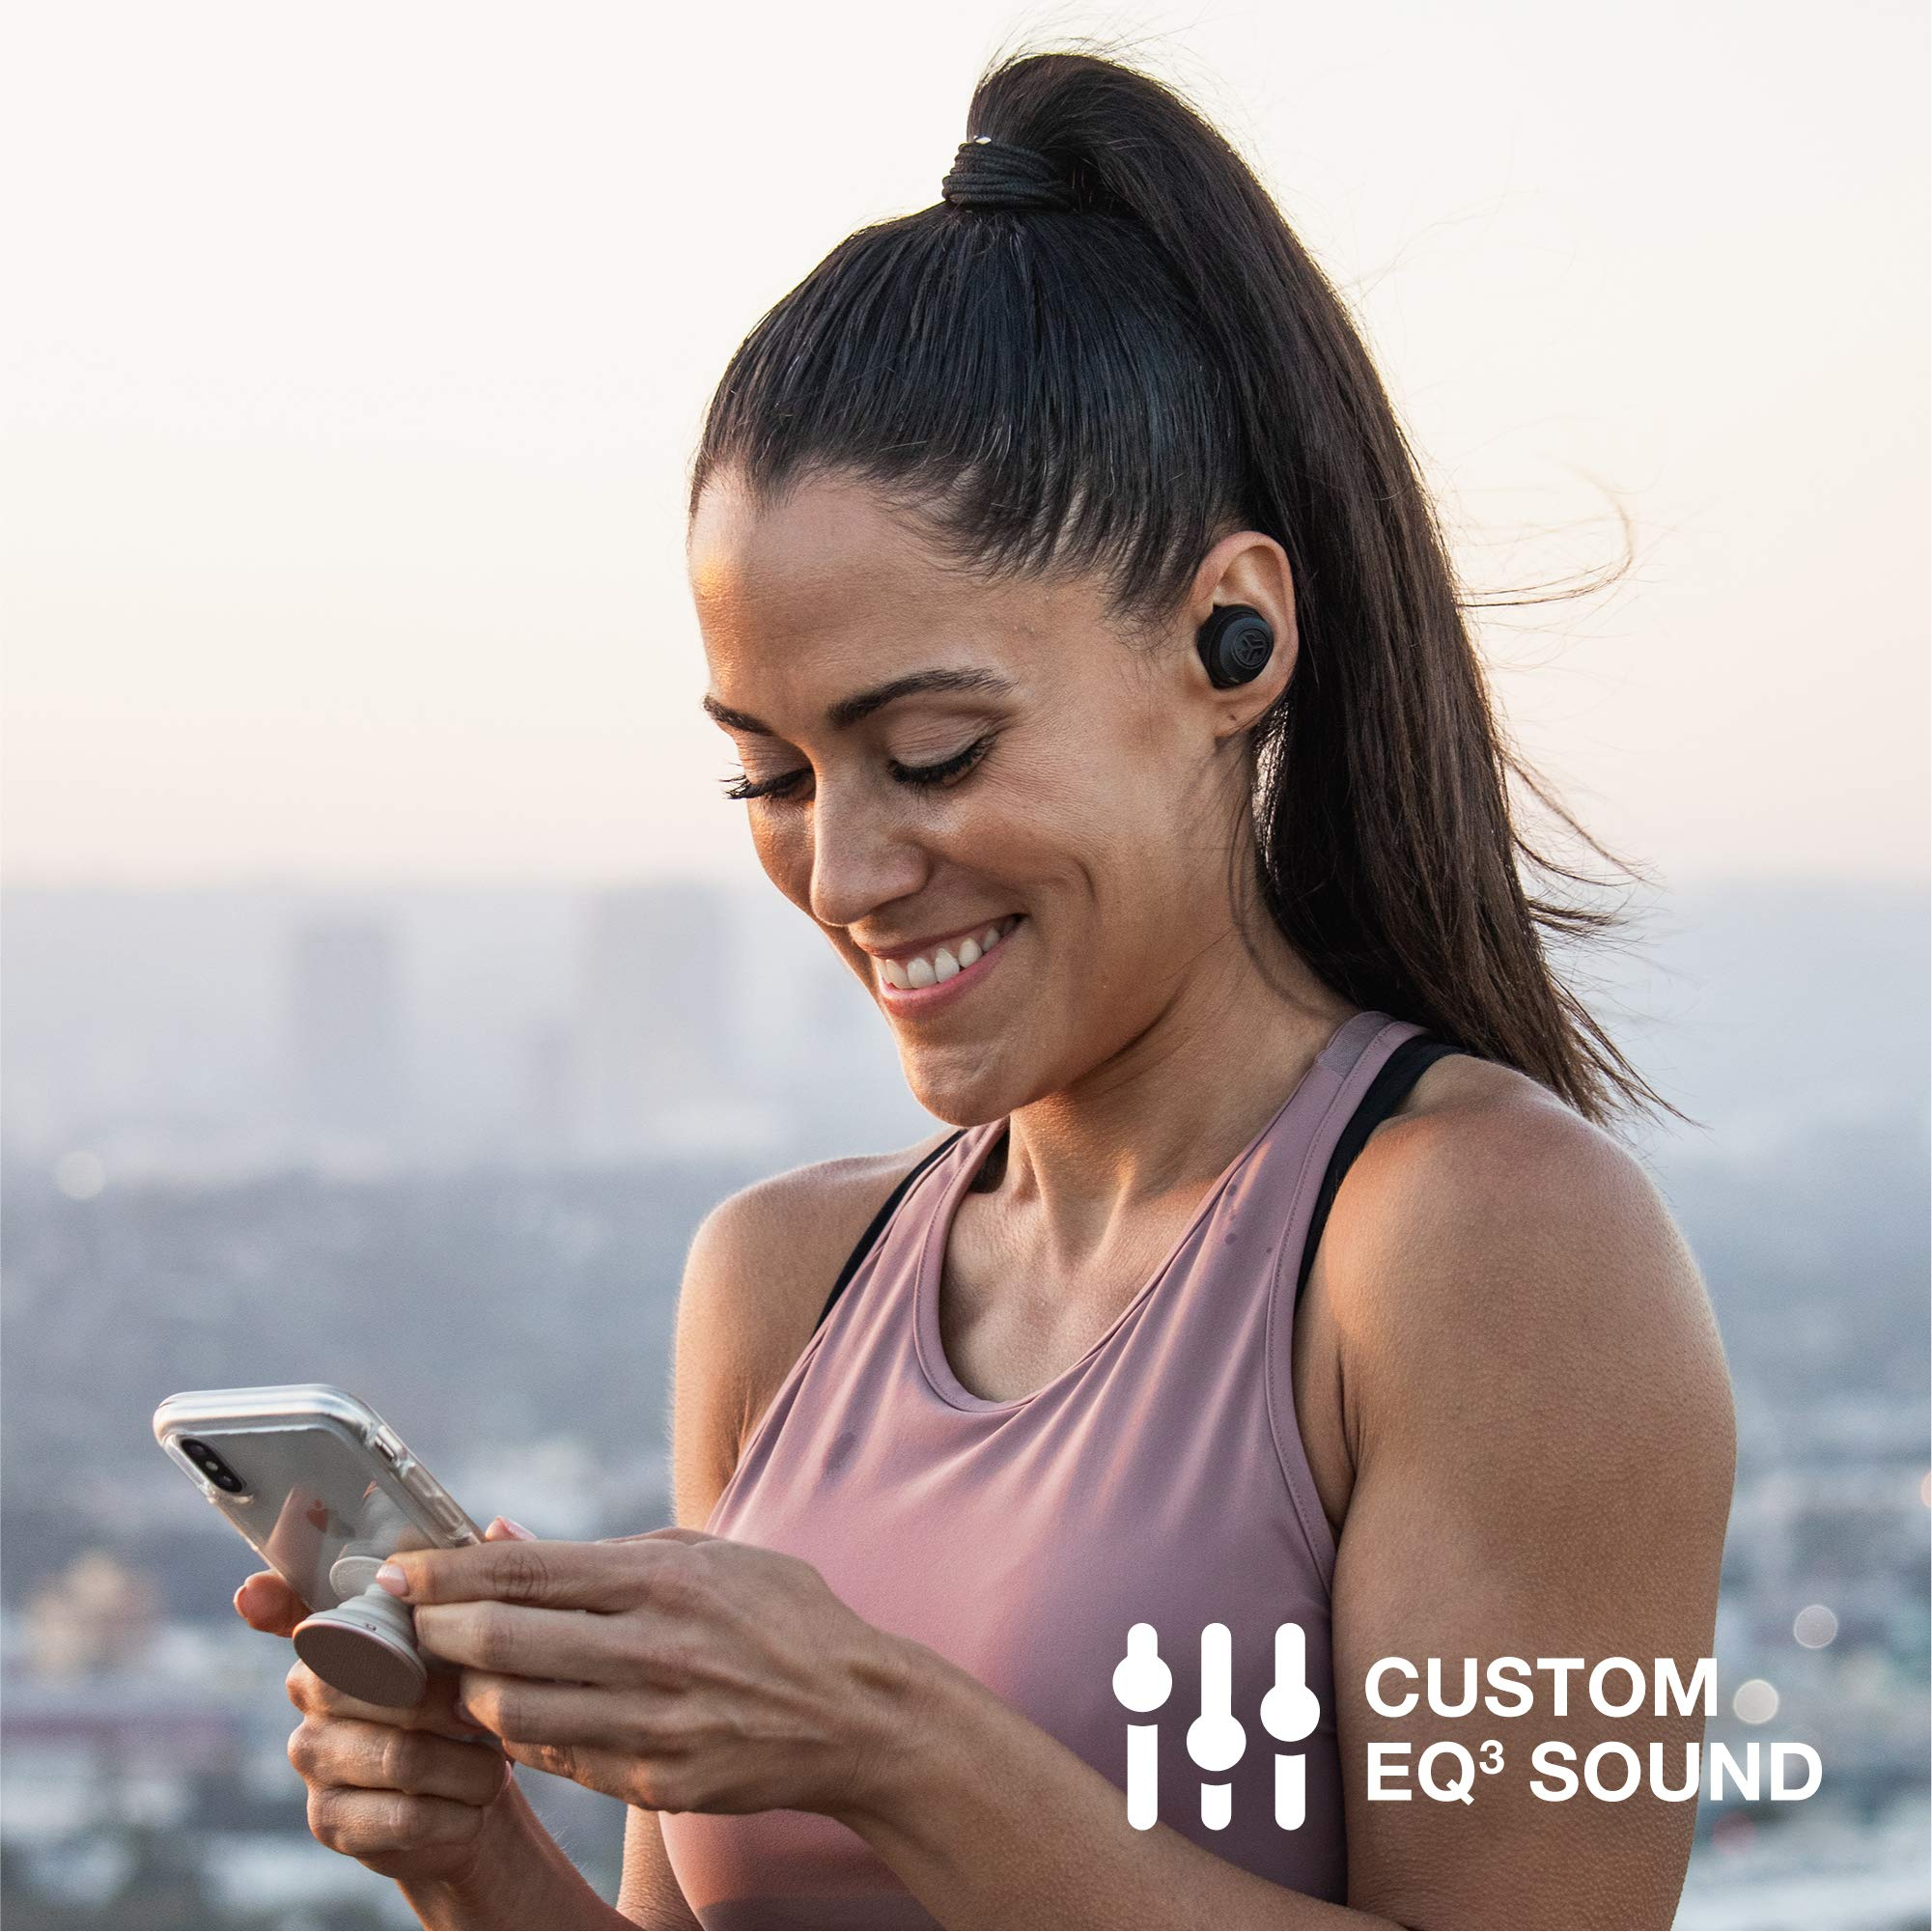 JLab Audio JBuds Air True Wireless Signature Bluetooth Earbuds + Charging Case - Black - IP55 Sweat Resistance - Bluetooth 5.0 Connection - 3 EQ Sound Settings: JLab Signature, Balanced, Bass Boost by JLAB (Image #5)